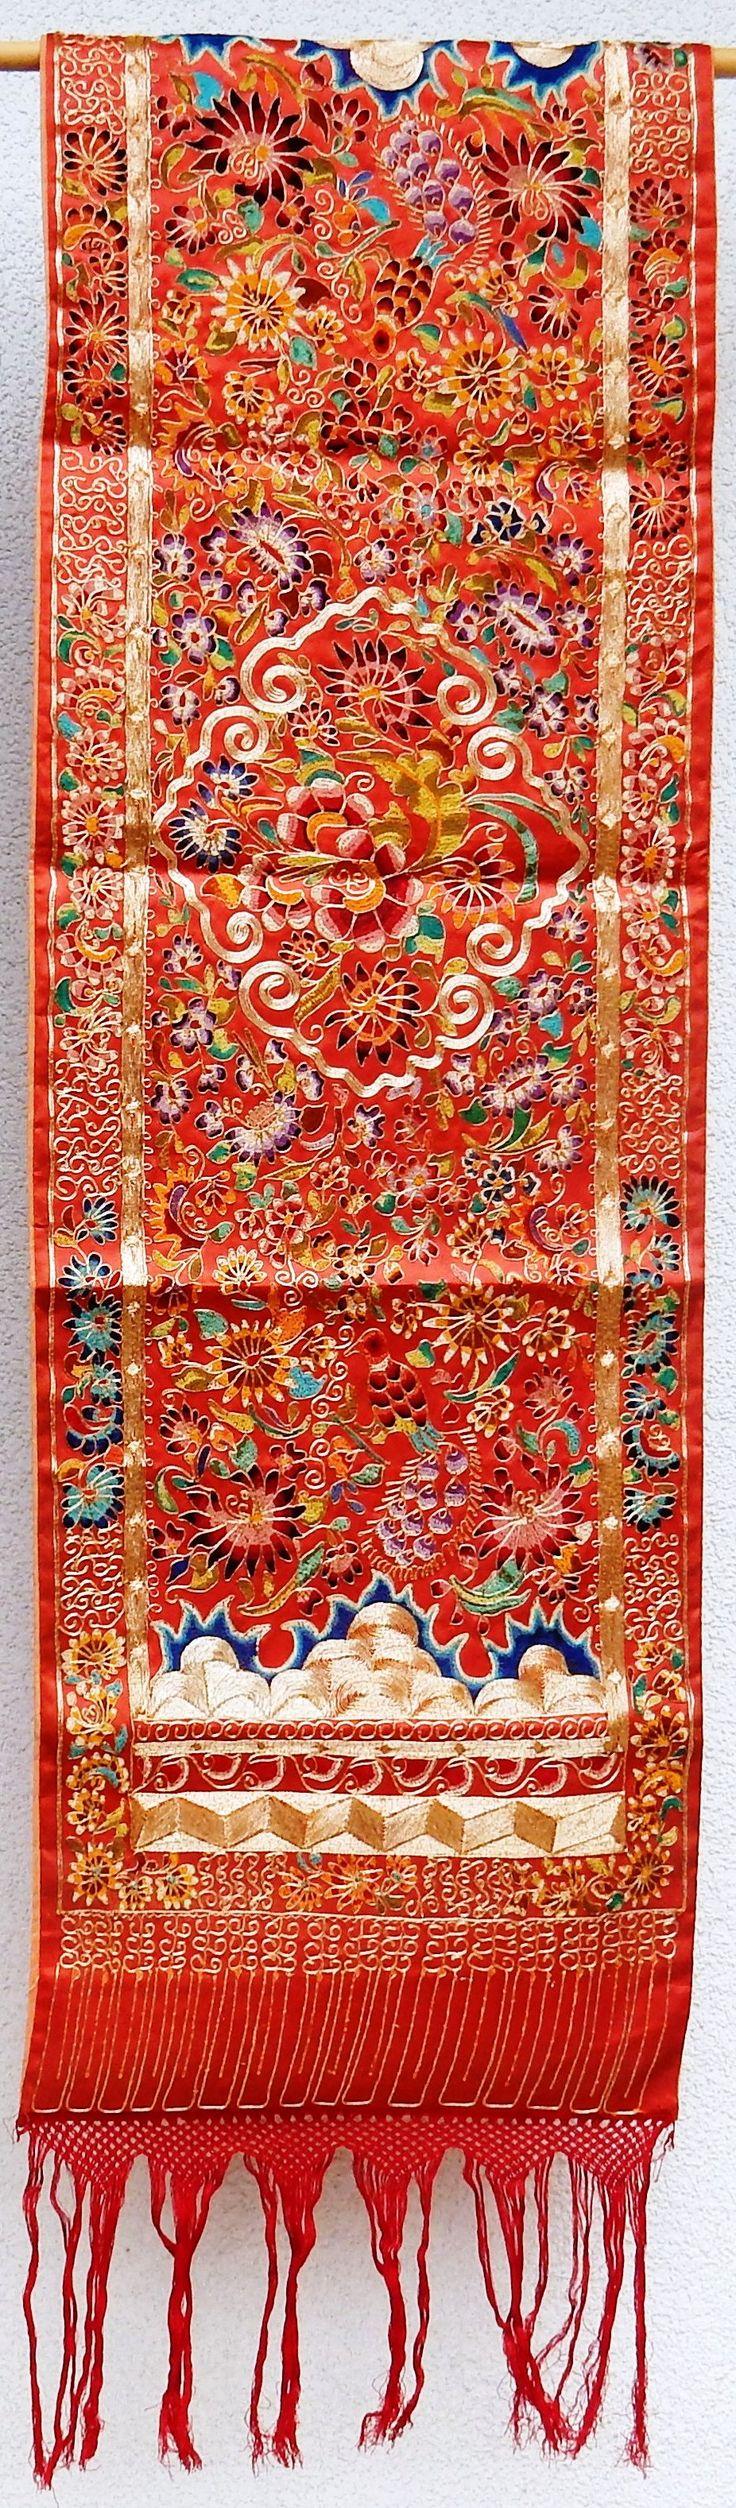 Minangkabau, West Sumatra, embroidery scarf, floral motif